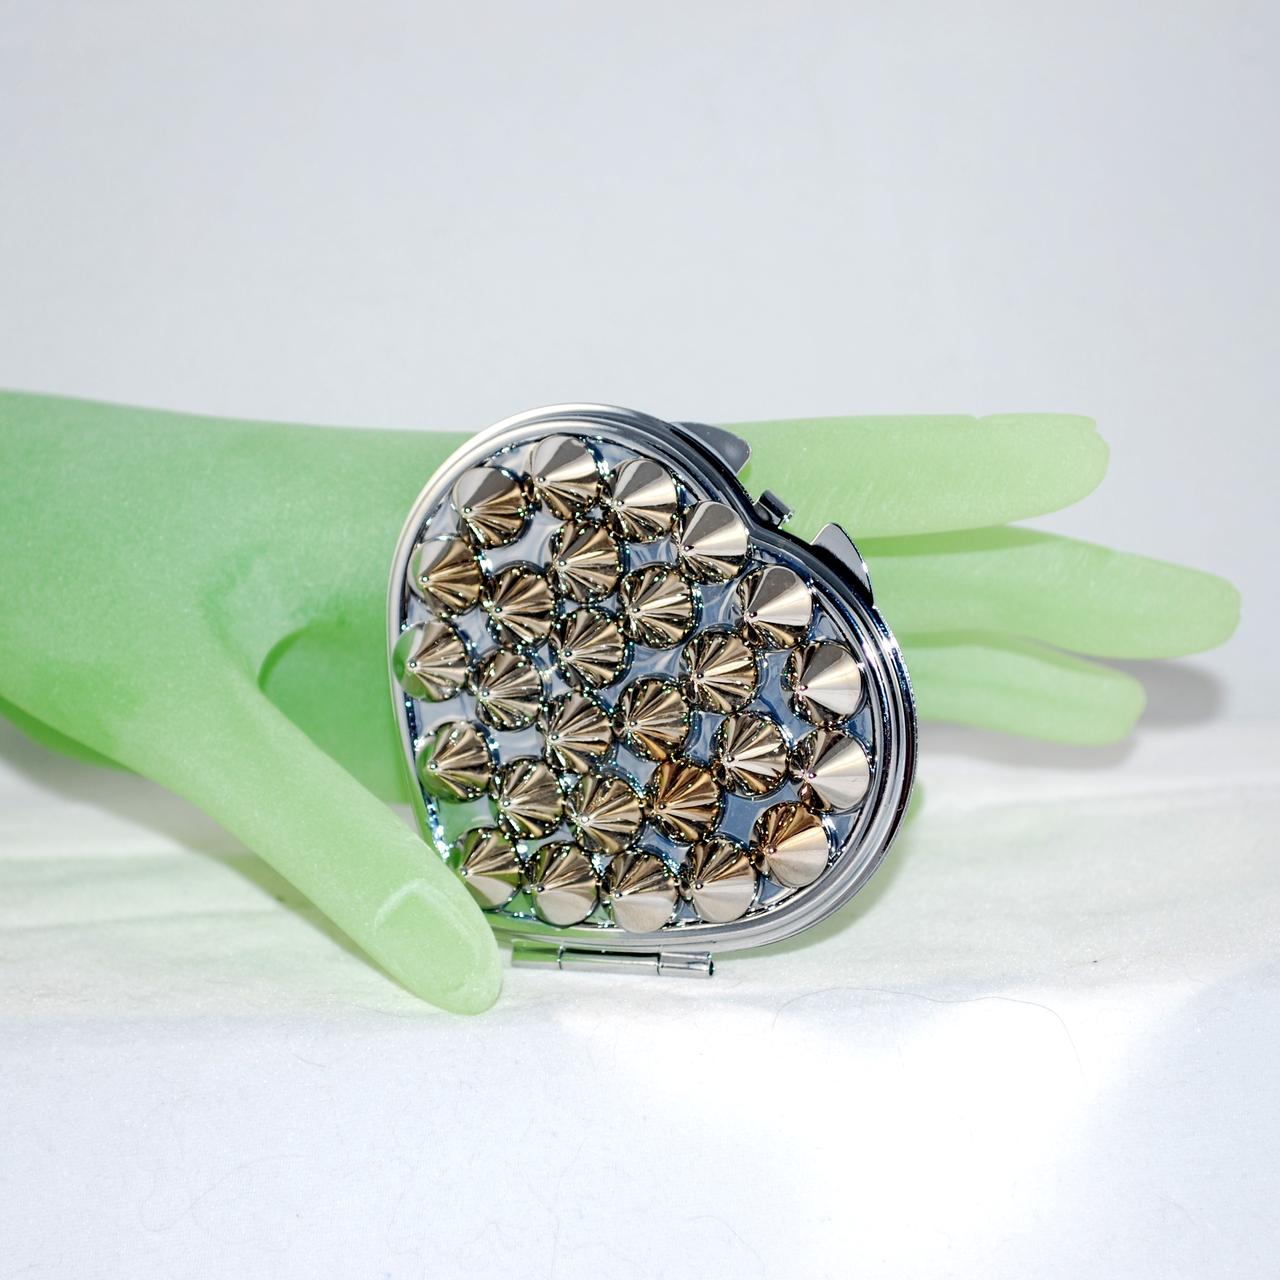 Enchanting Jewelry Creations image 10